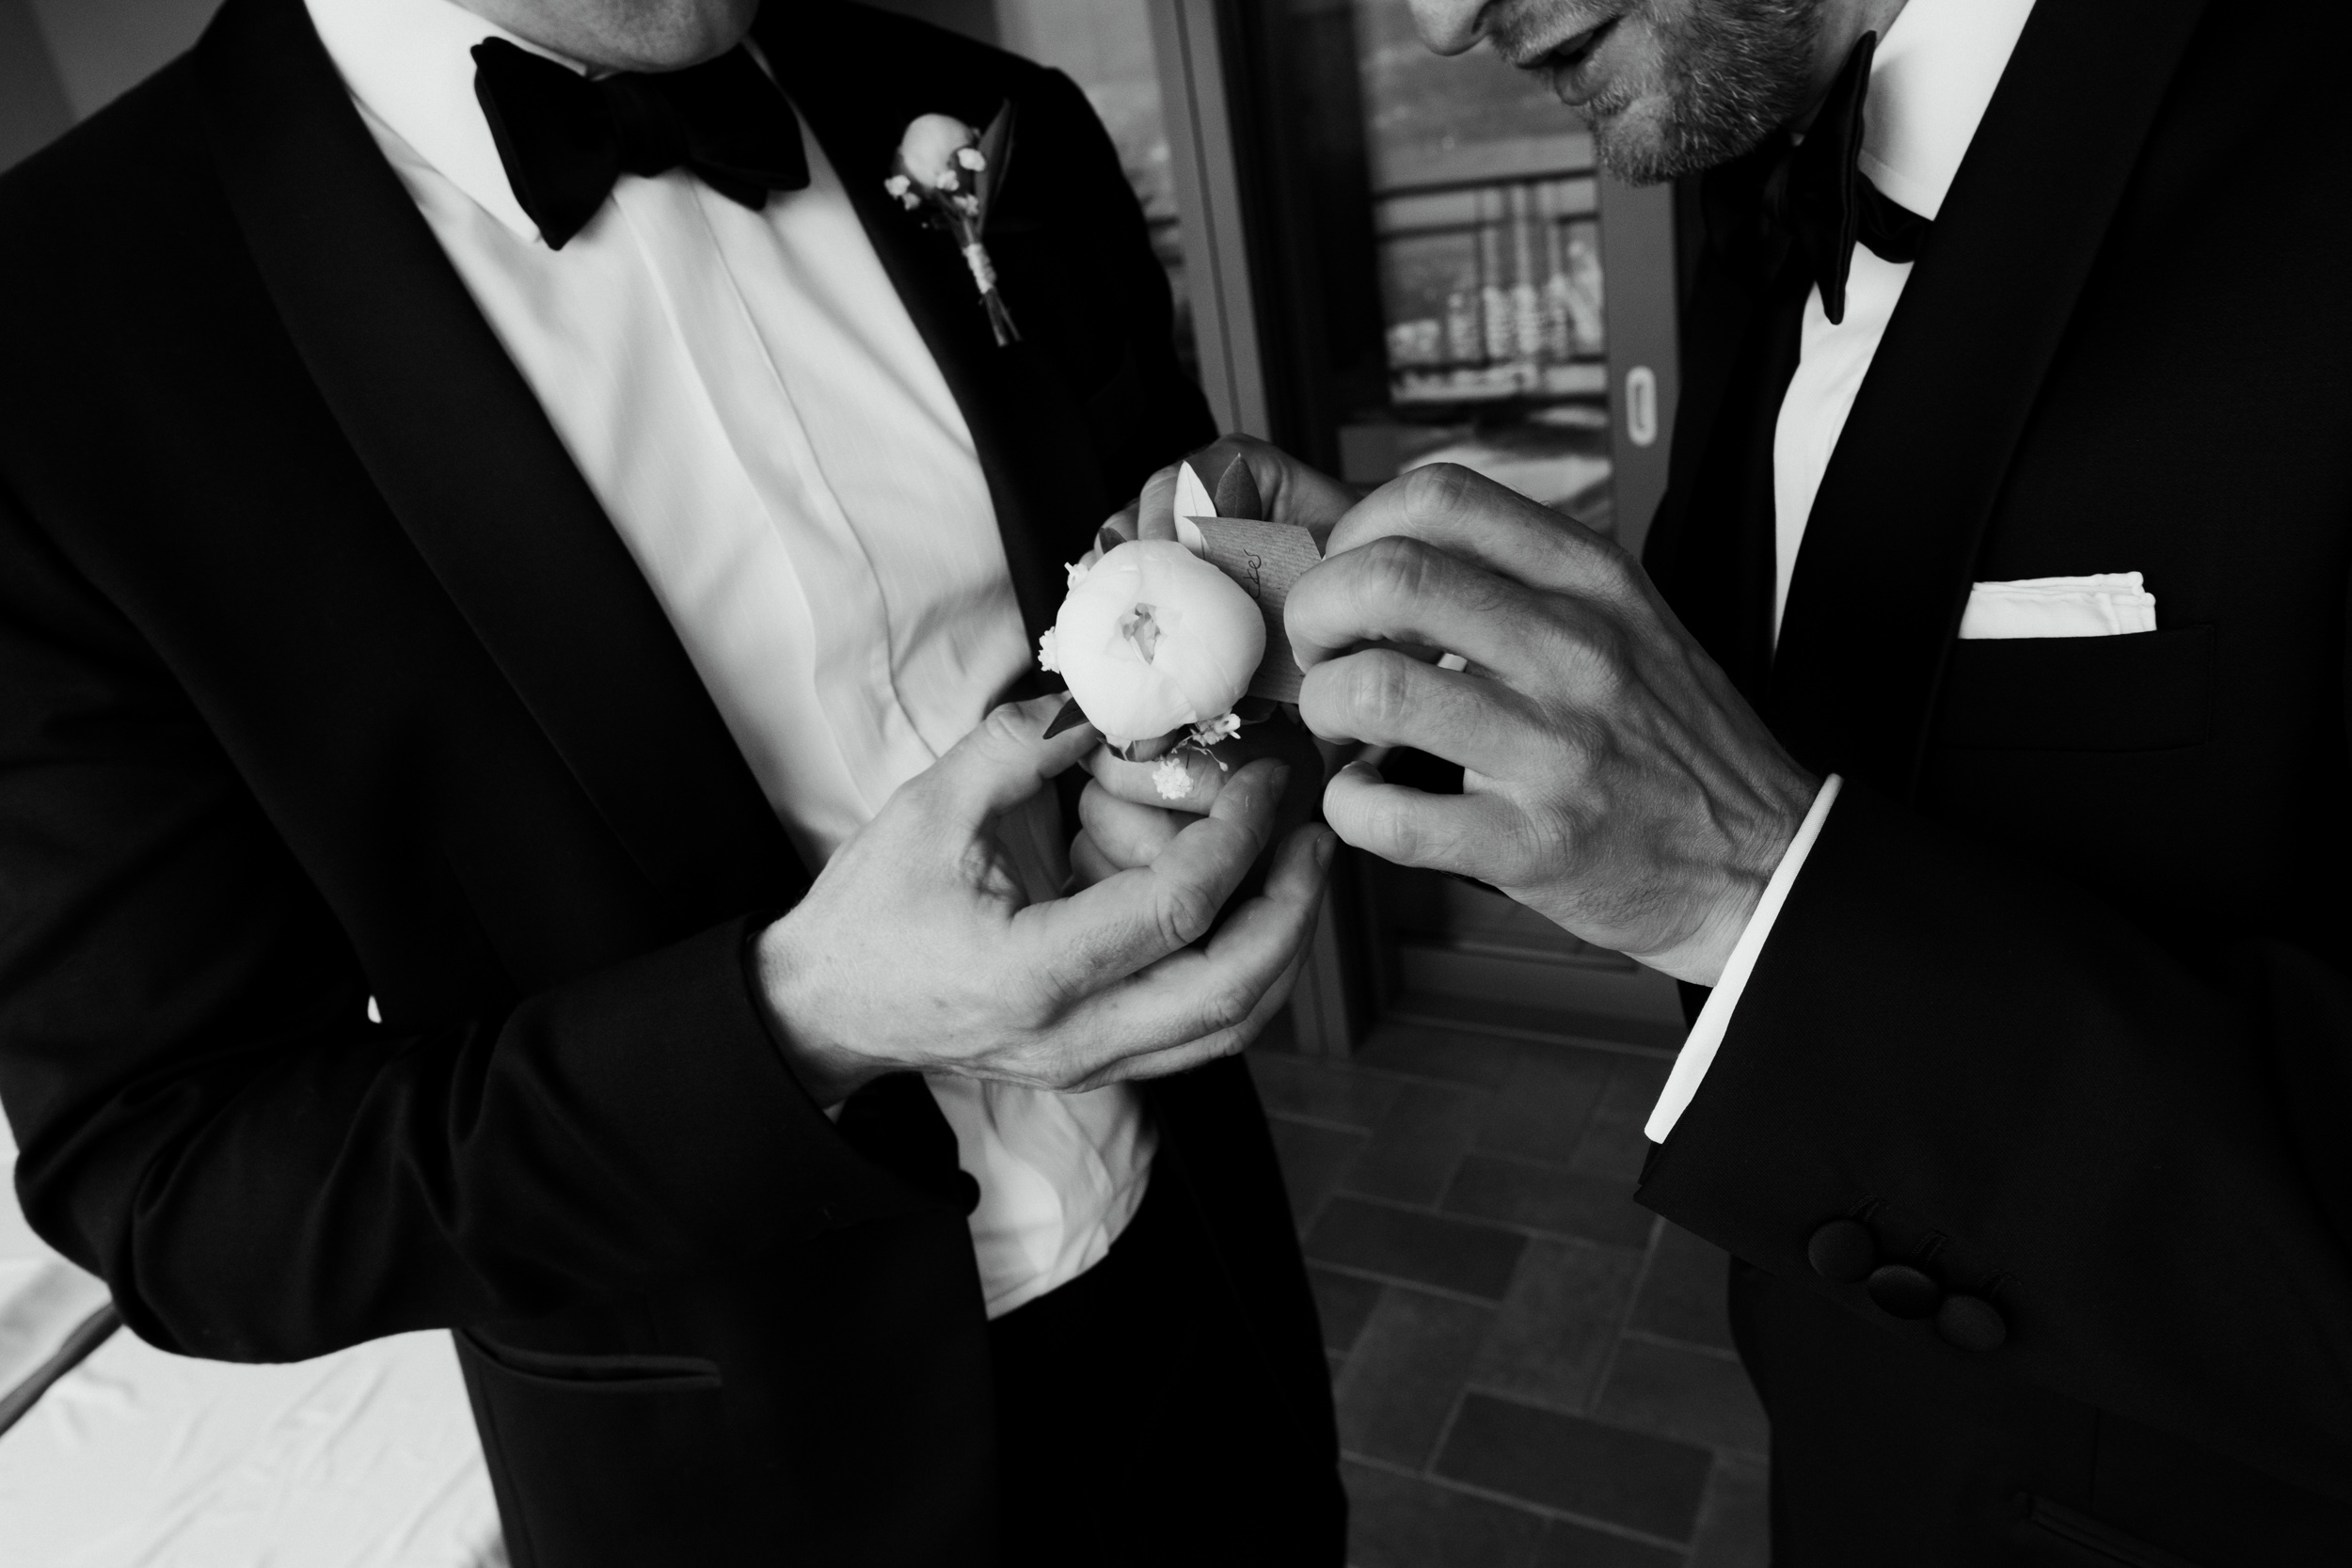 olivia-andreas-wedding-switzerland-68.jpg